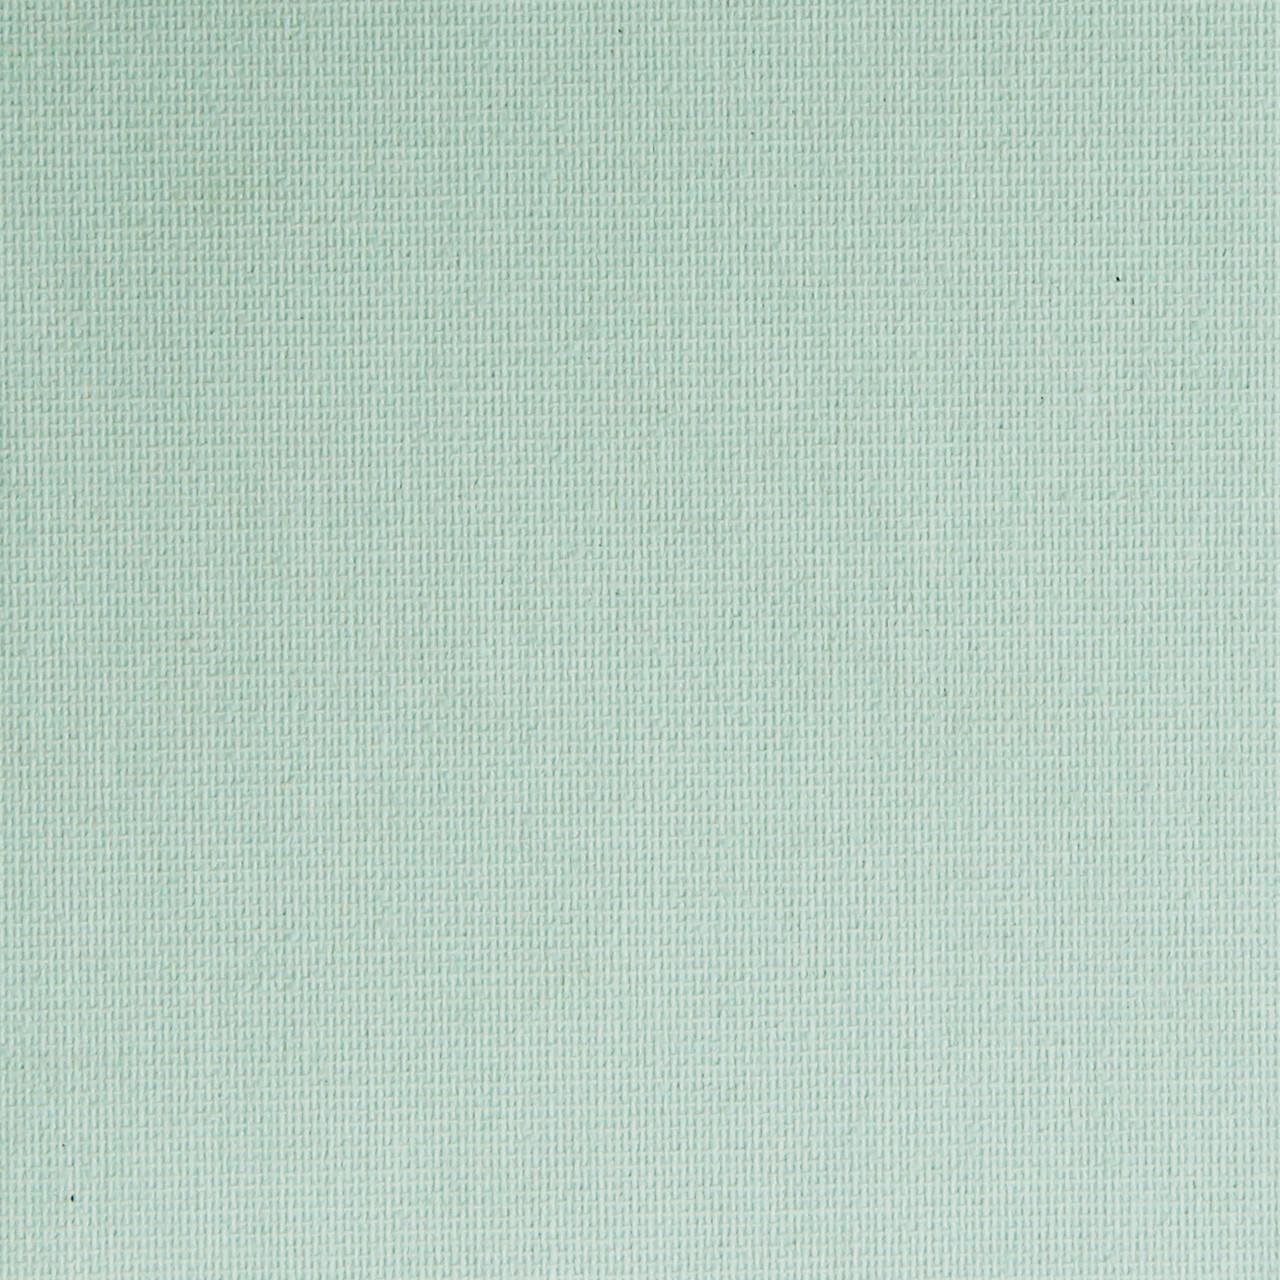 Рулонные шторы Ткань Однотонная А-619 Серо-зелёный